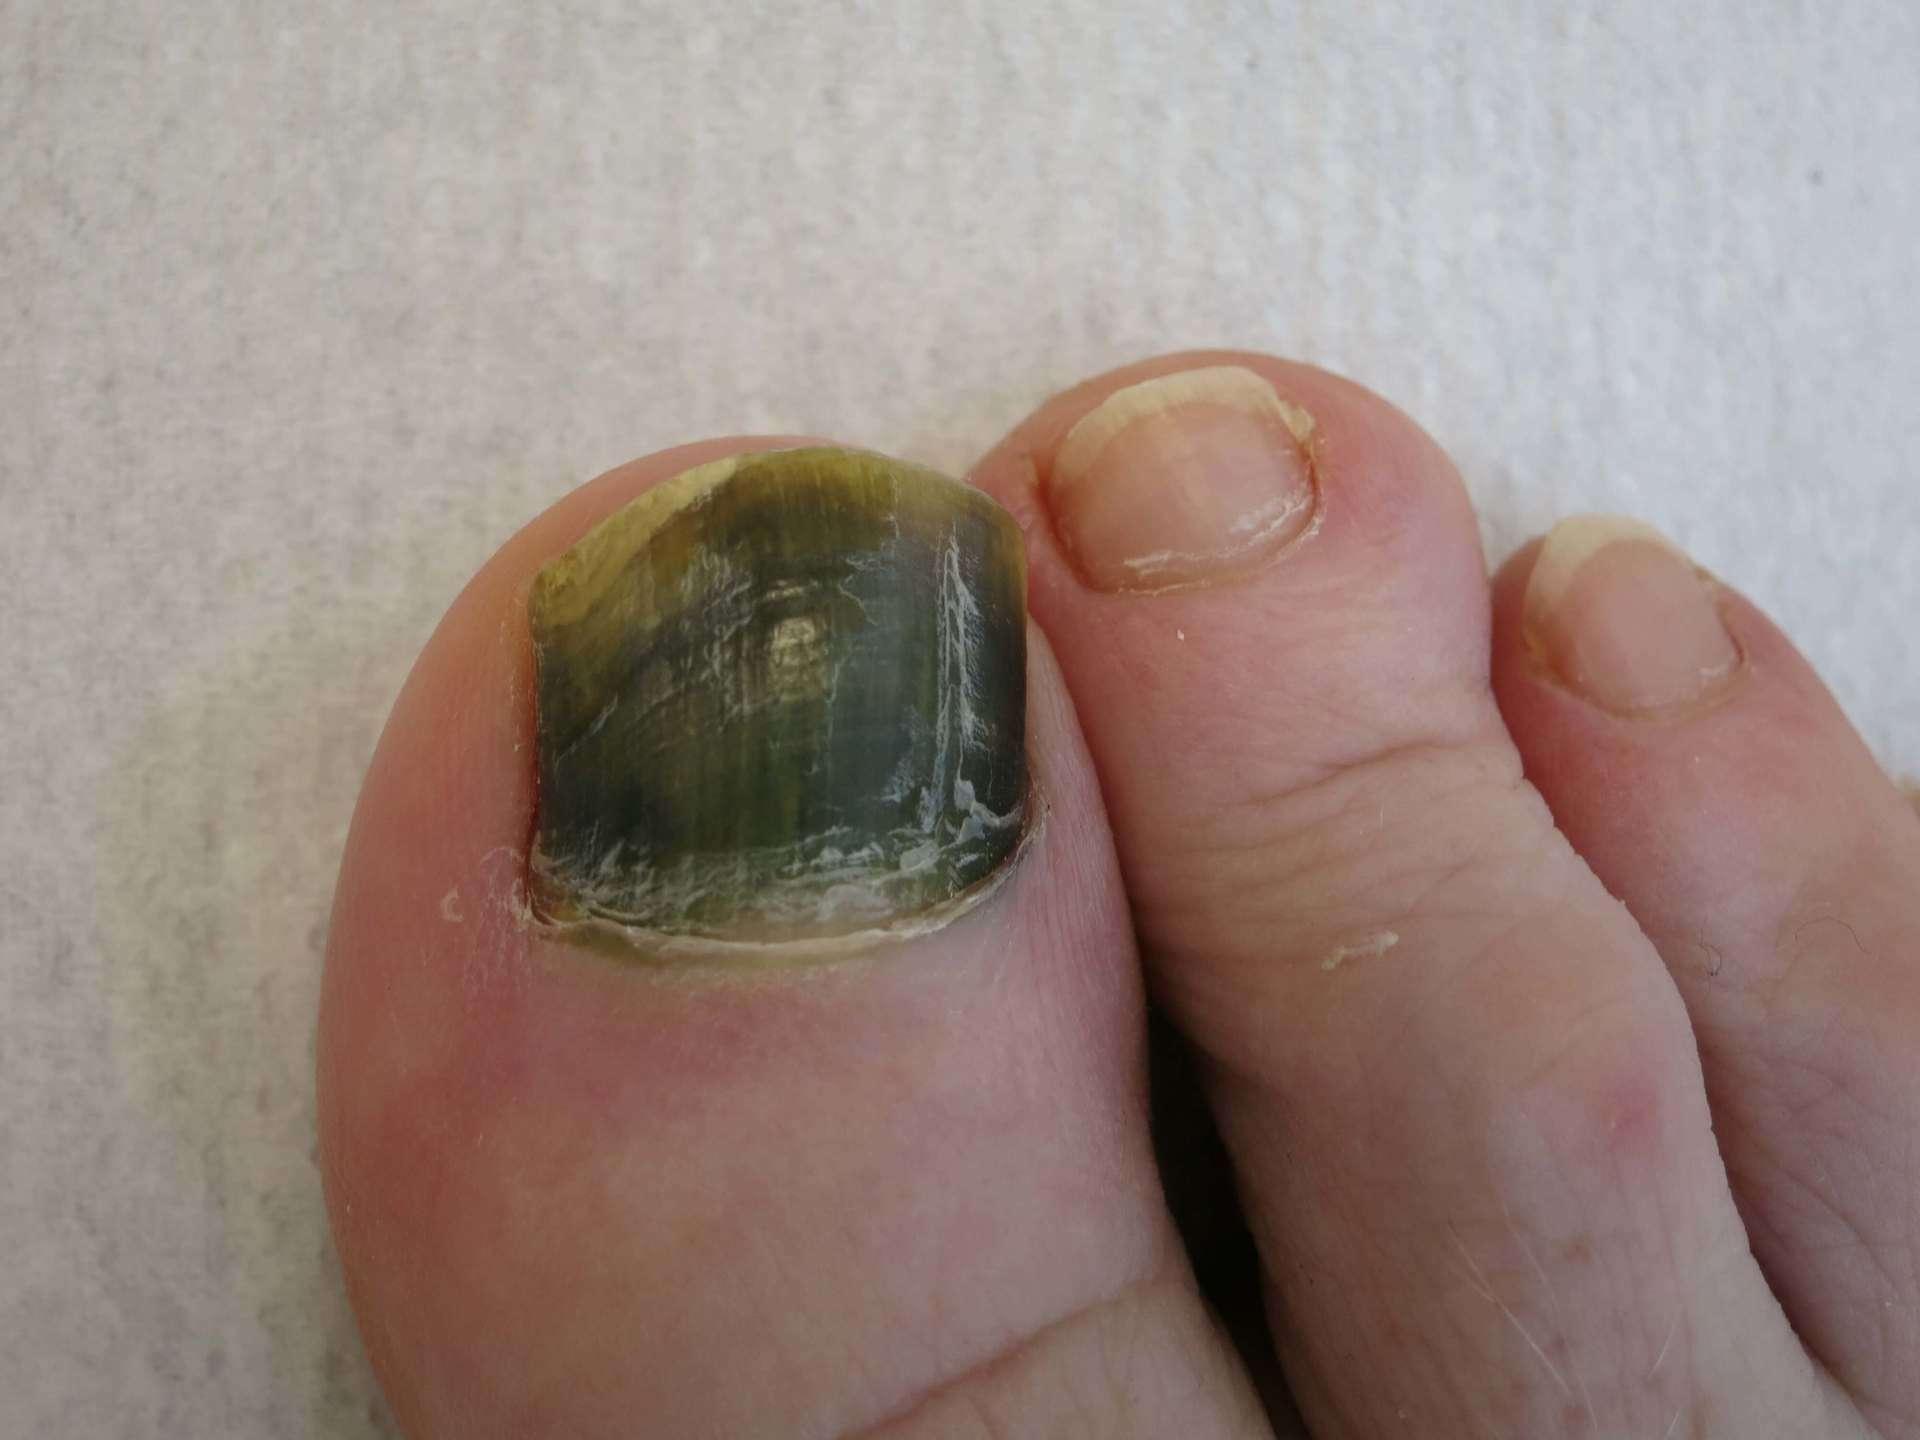 Pseudomonas nail